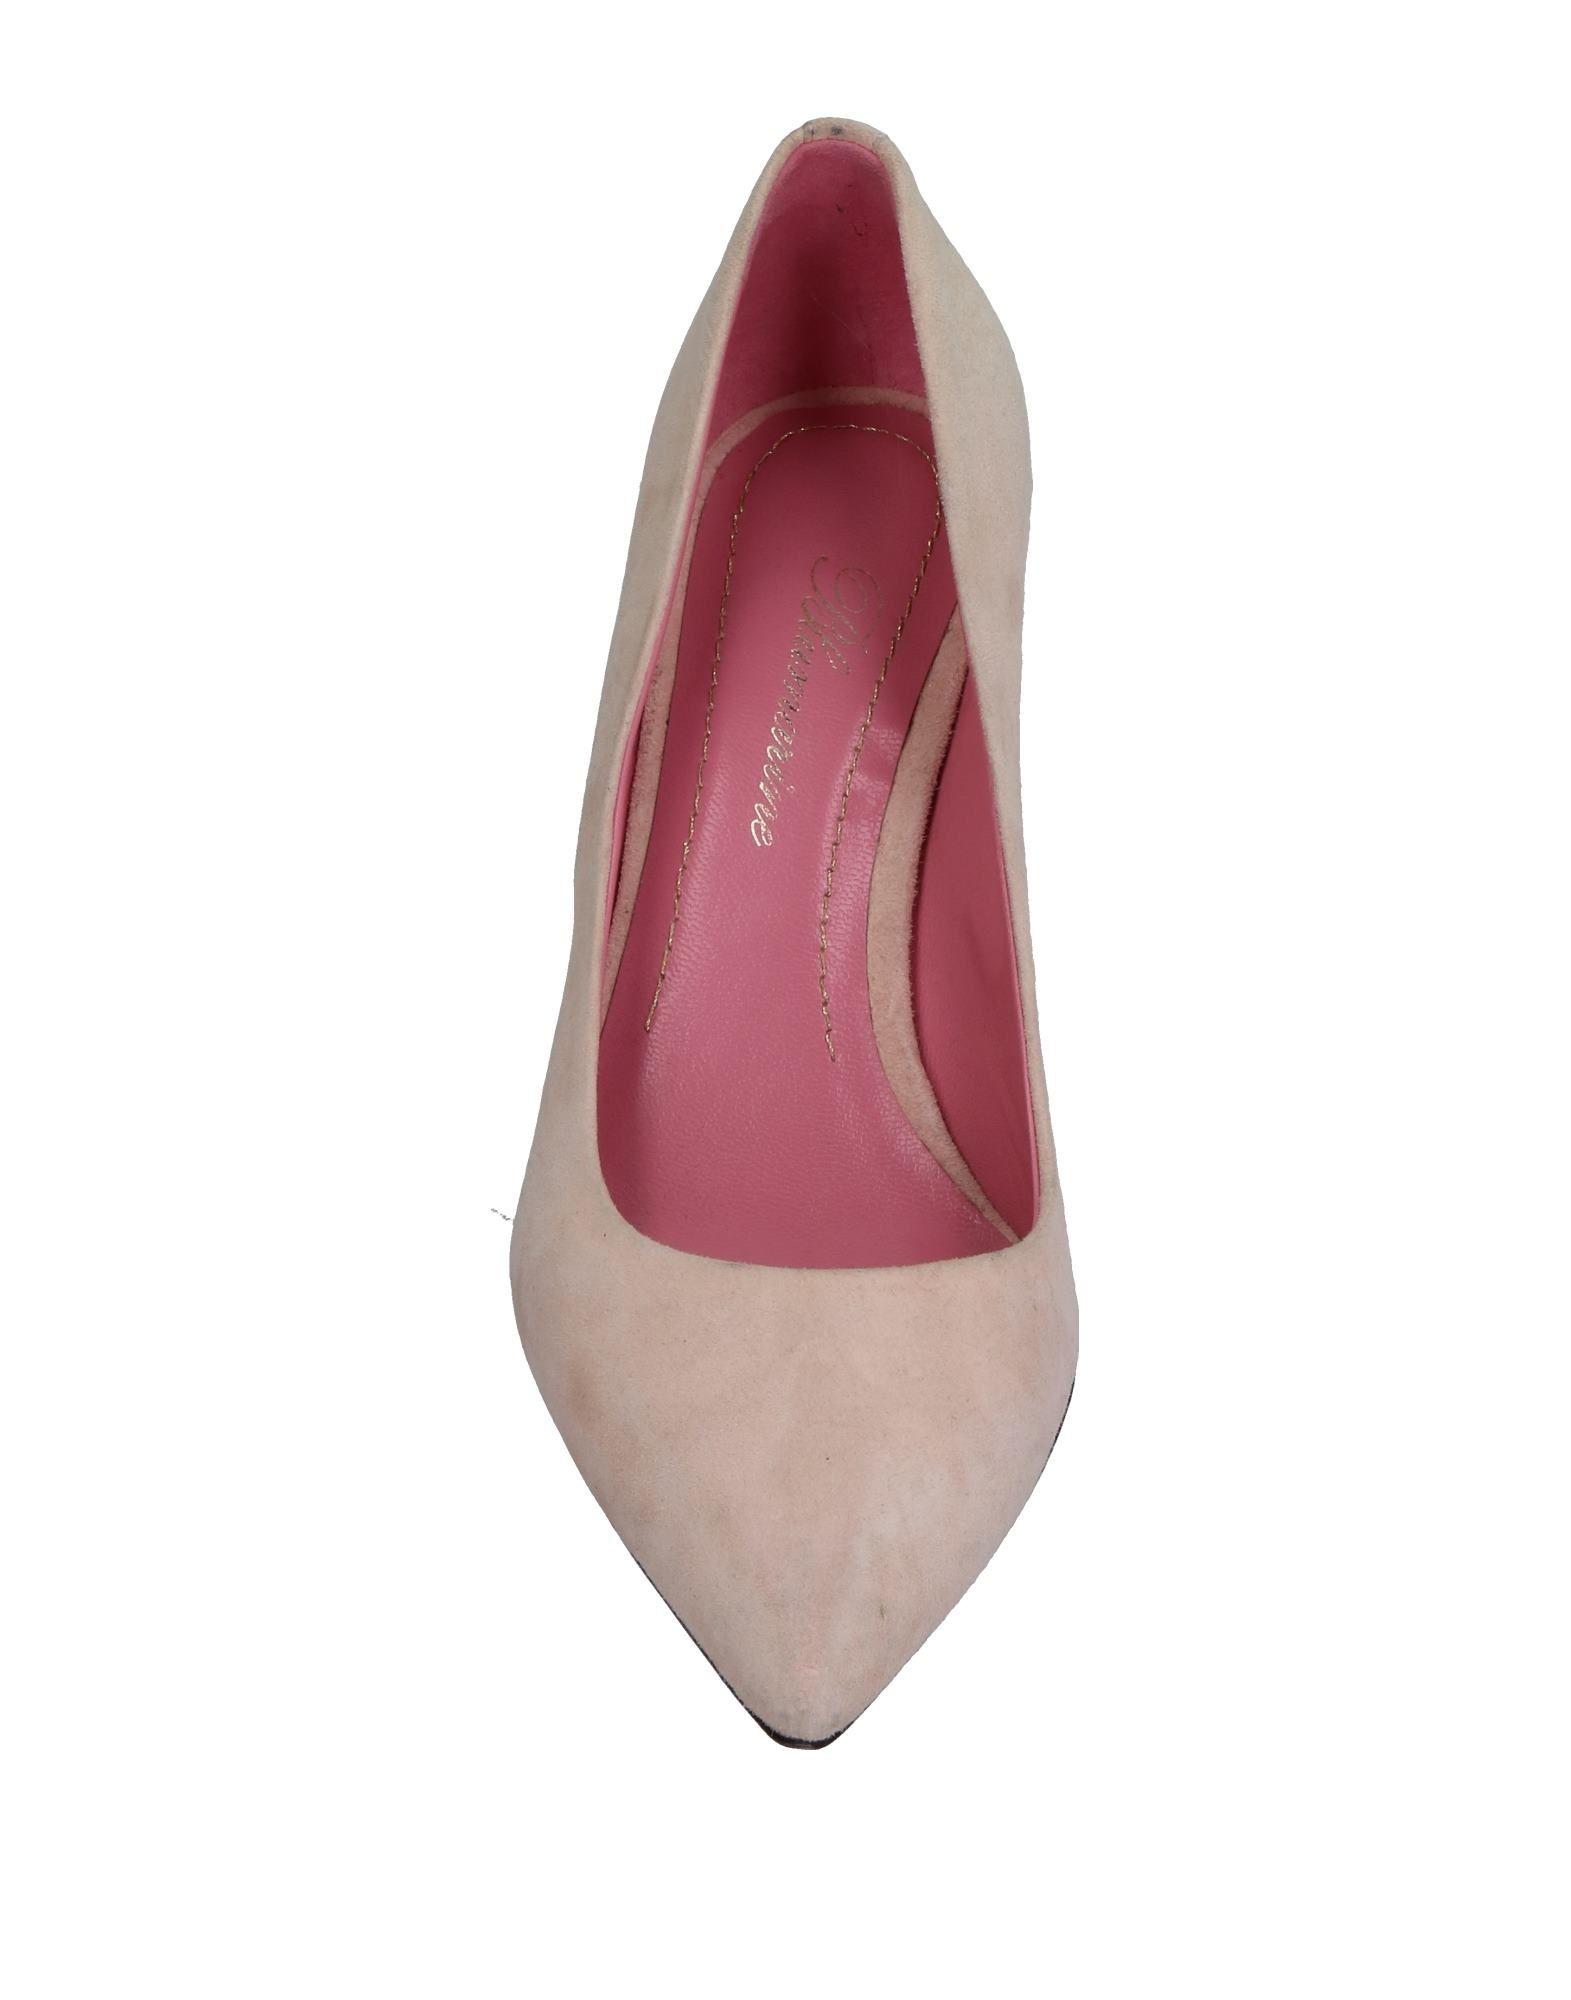 Rabatt Schuhe Blumarine Pumps  Damen  Pumps 11315875EJ f0136e